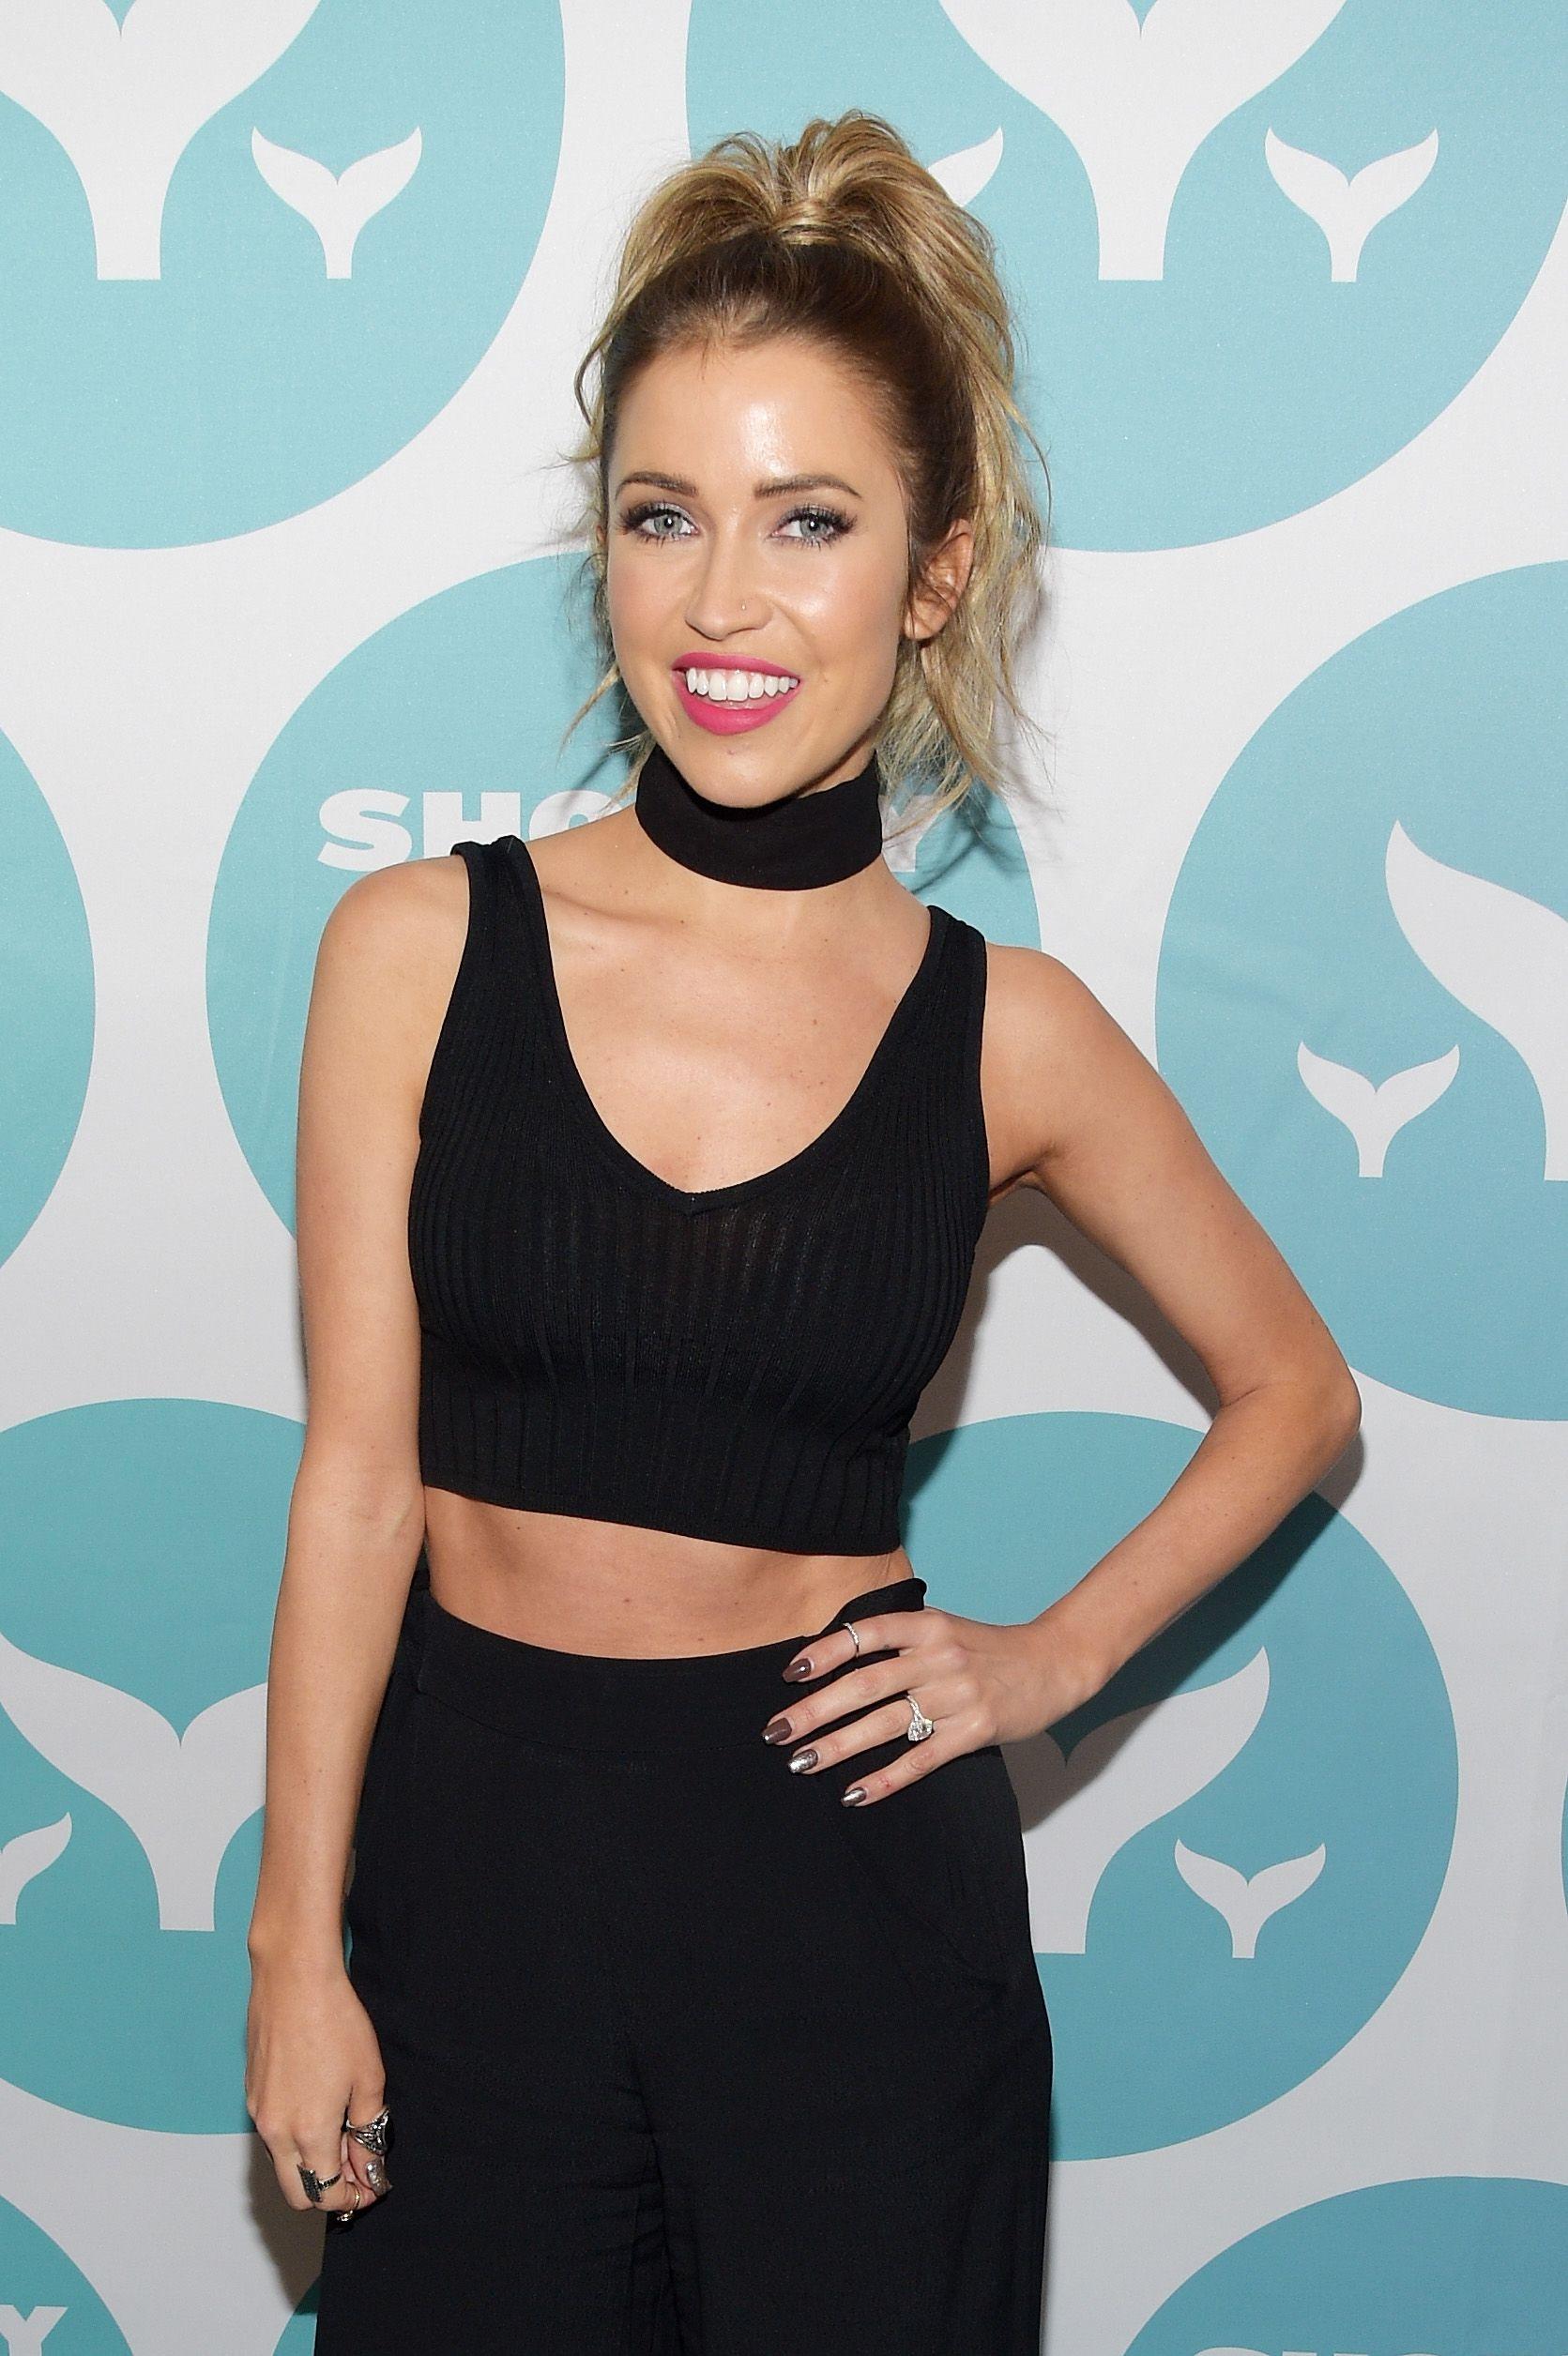 Kaitlyn Bristowe wears a black crop top and matching choker.